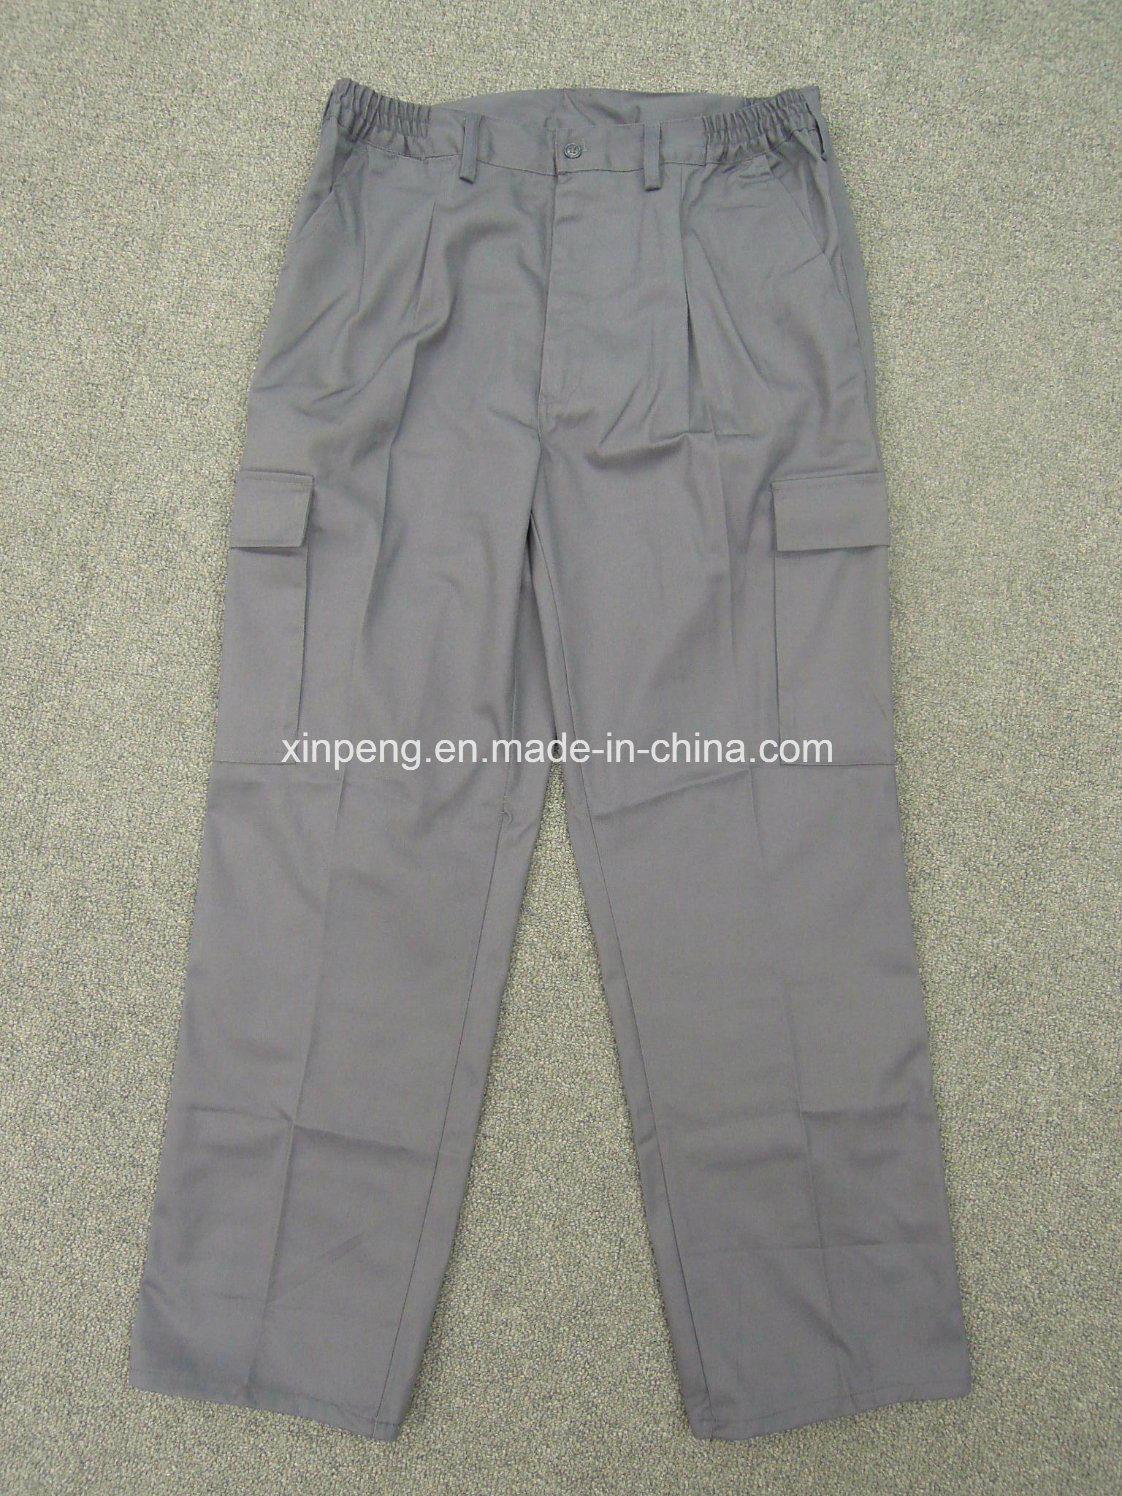 Safety Cargo Pants with Side Pocket Spain Market Design 6pockets